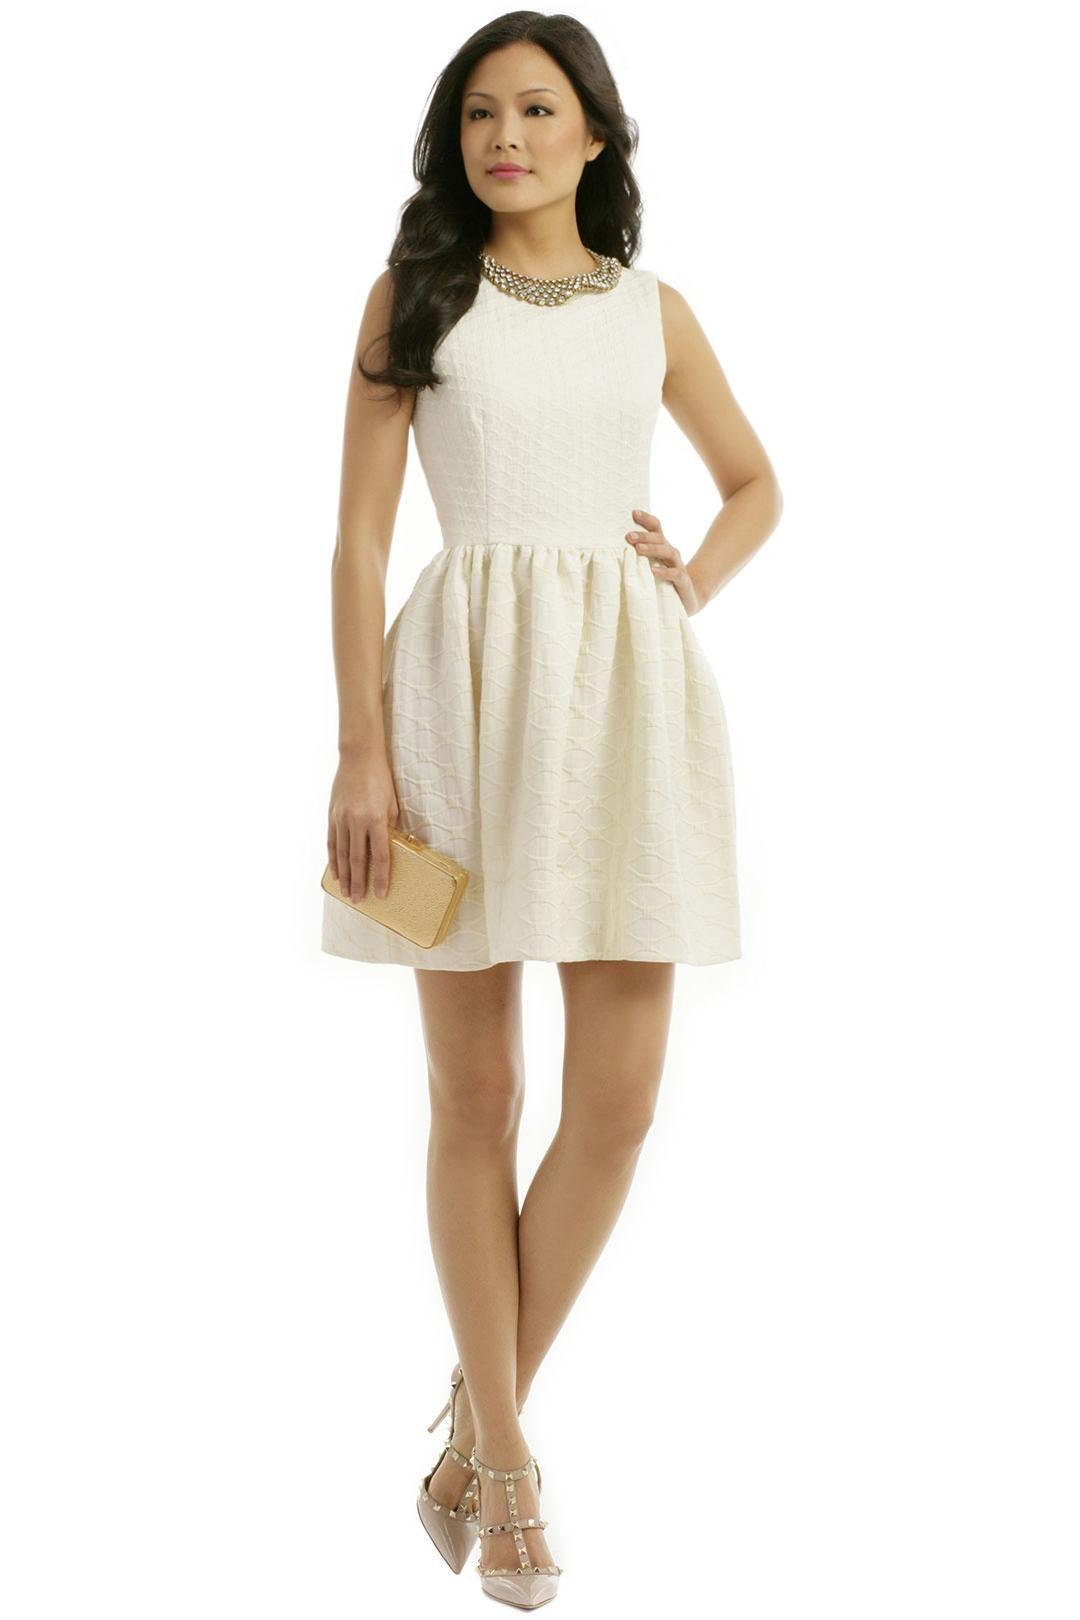 Rent designer wedding dress  RED Valentino Scarletta Dress  White Hot  Pinterest  Valentino